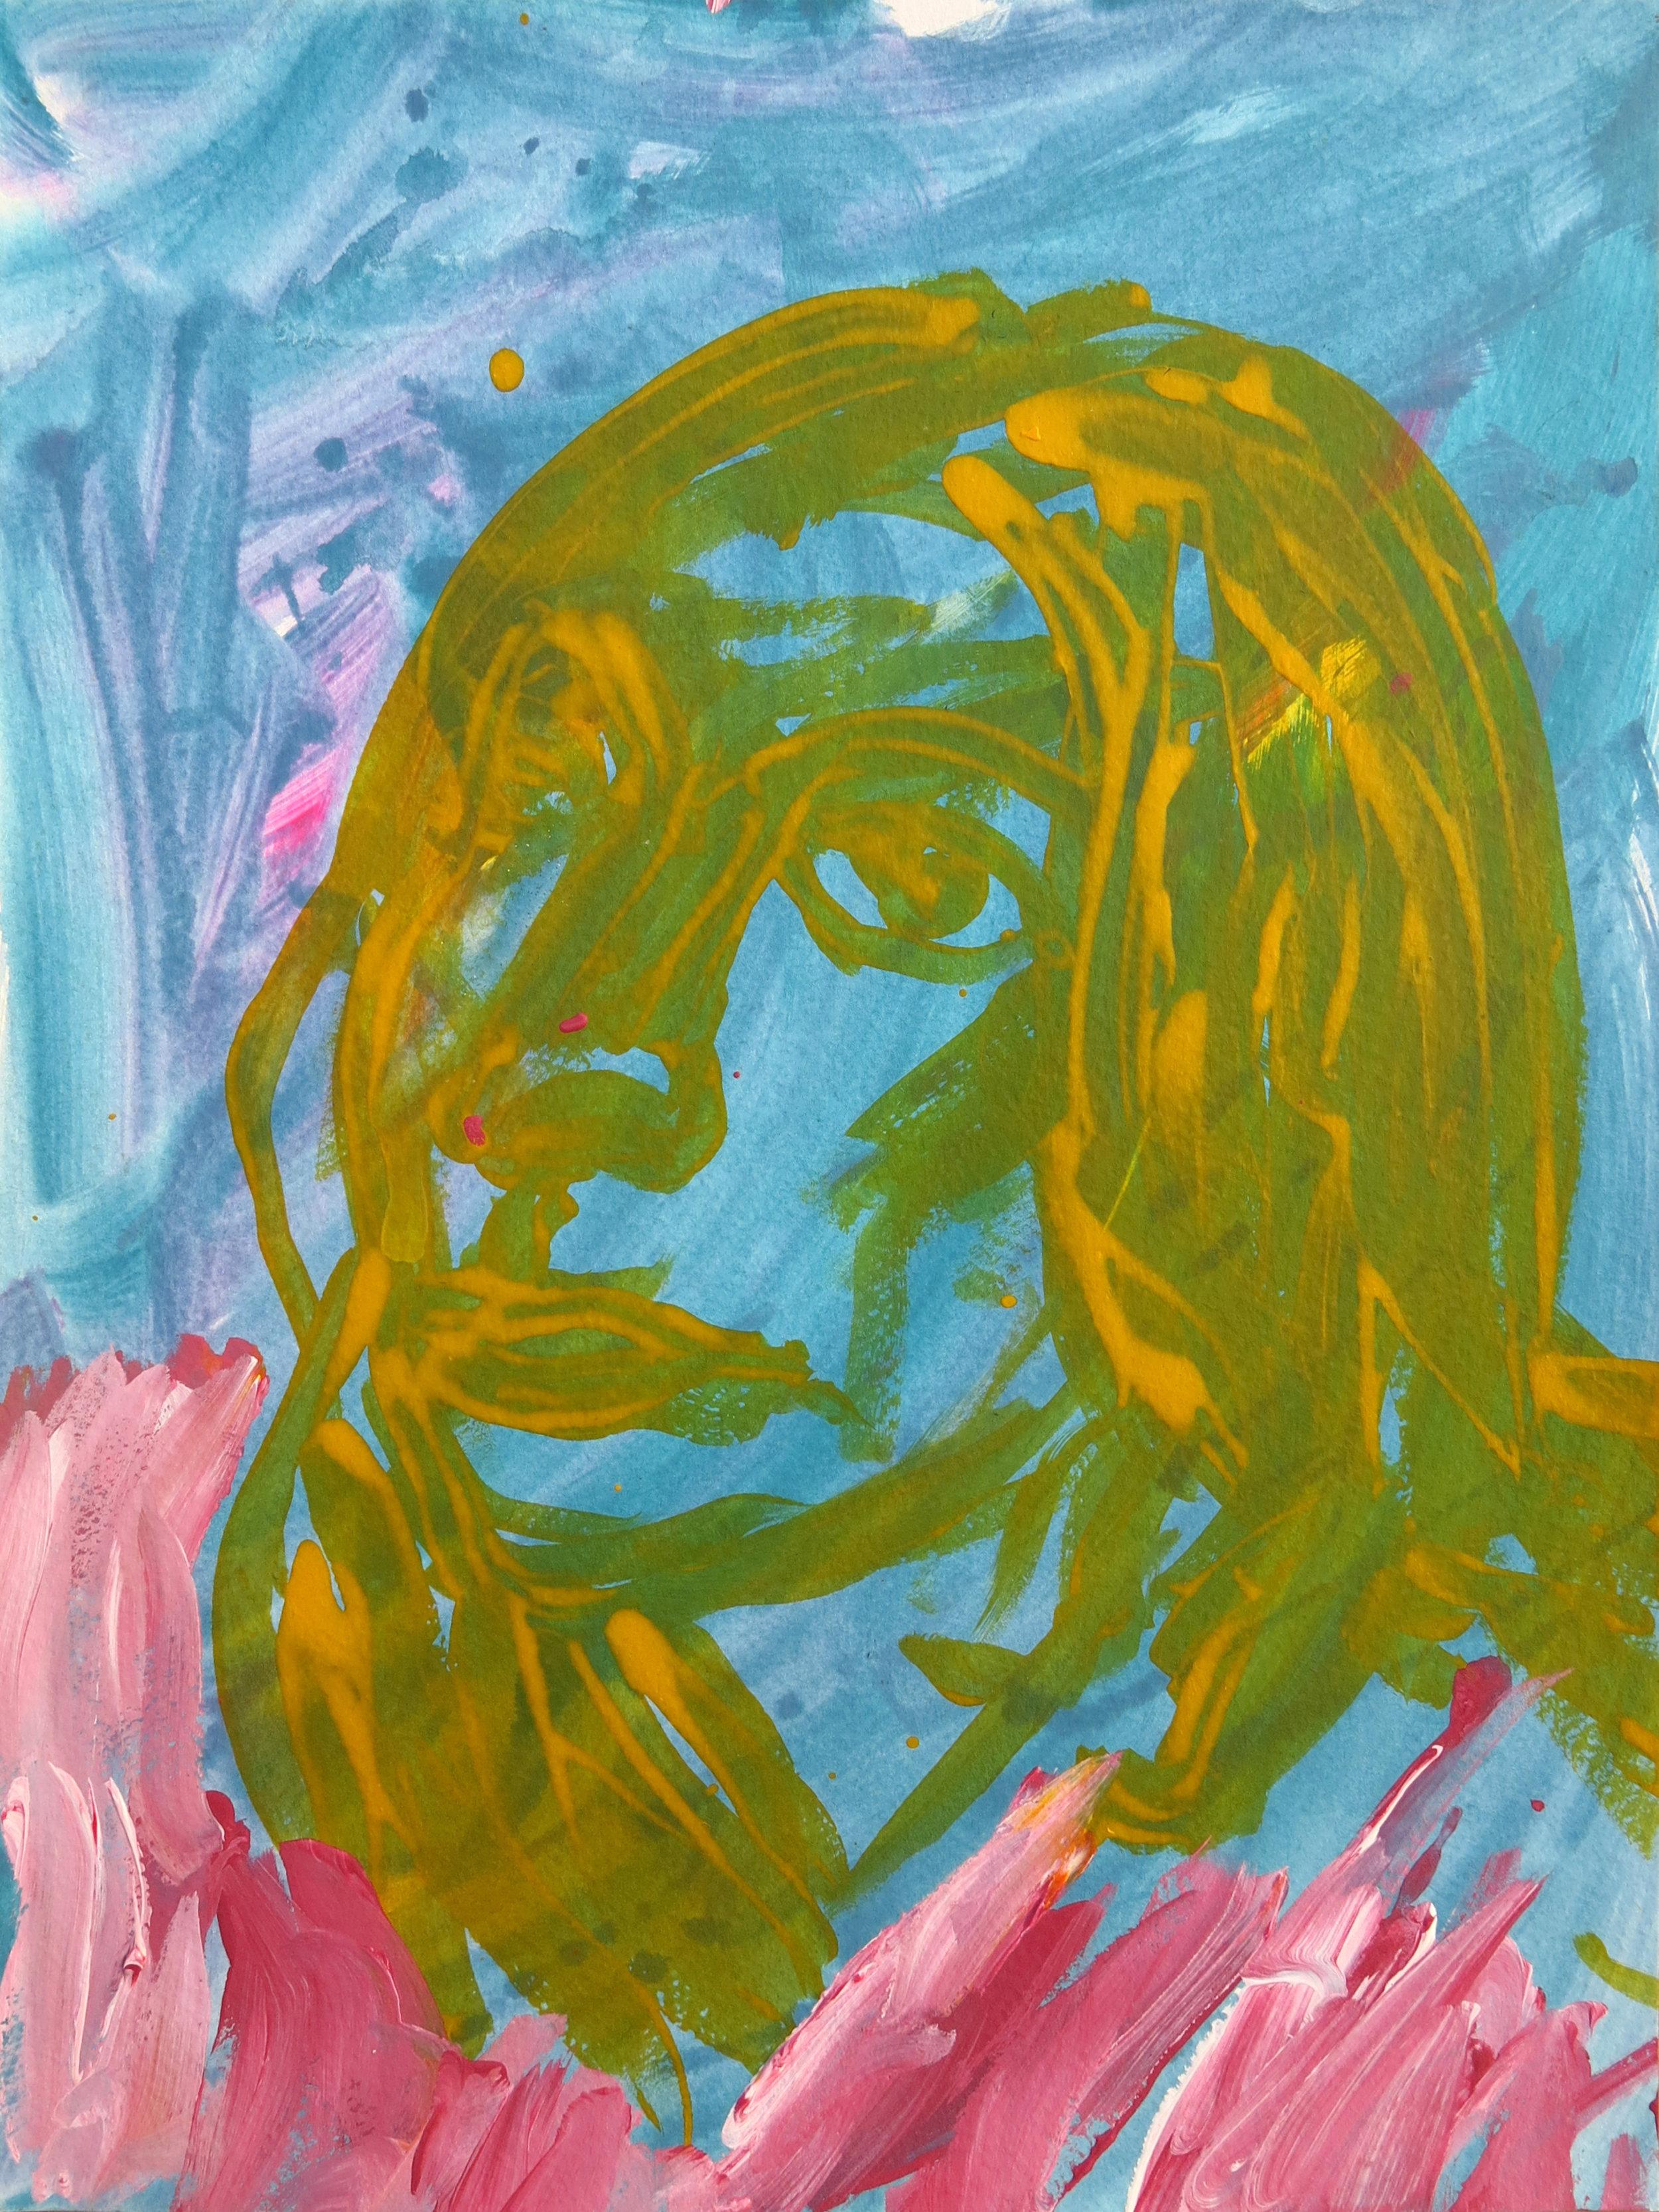 Barbra Streisand Portrait #24